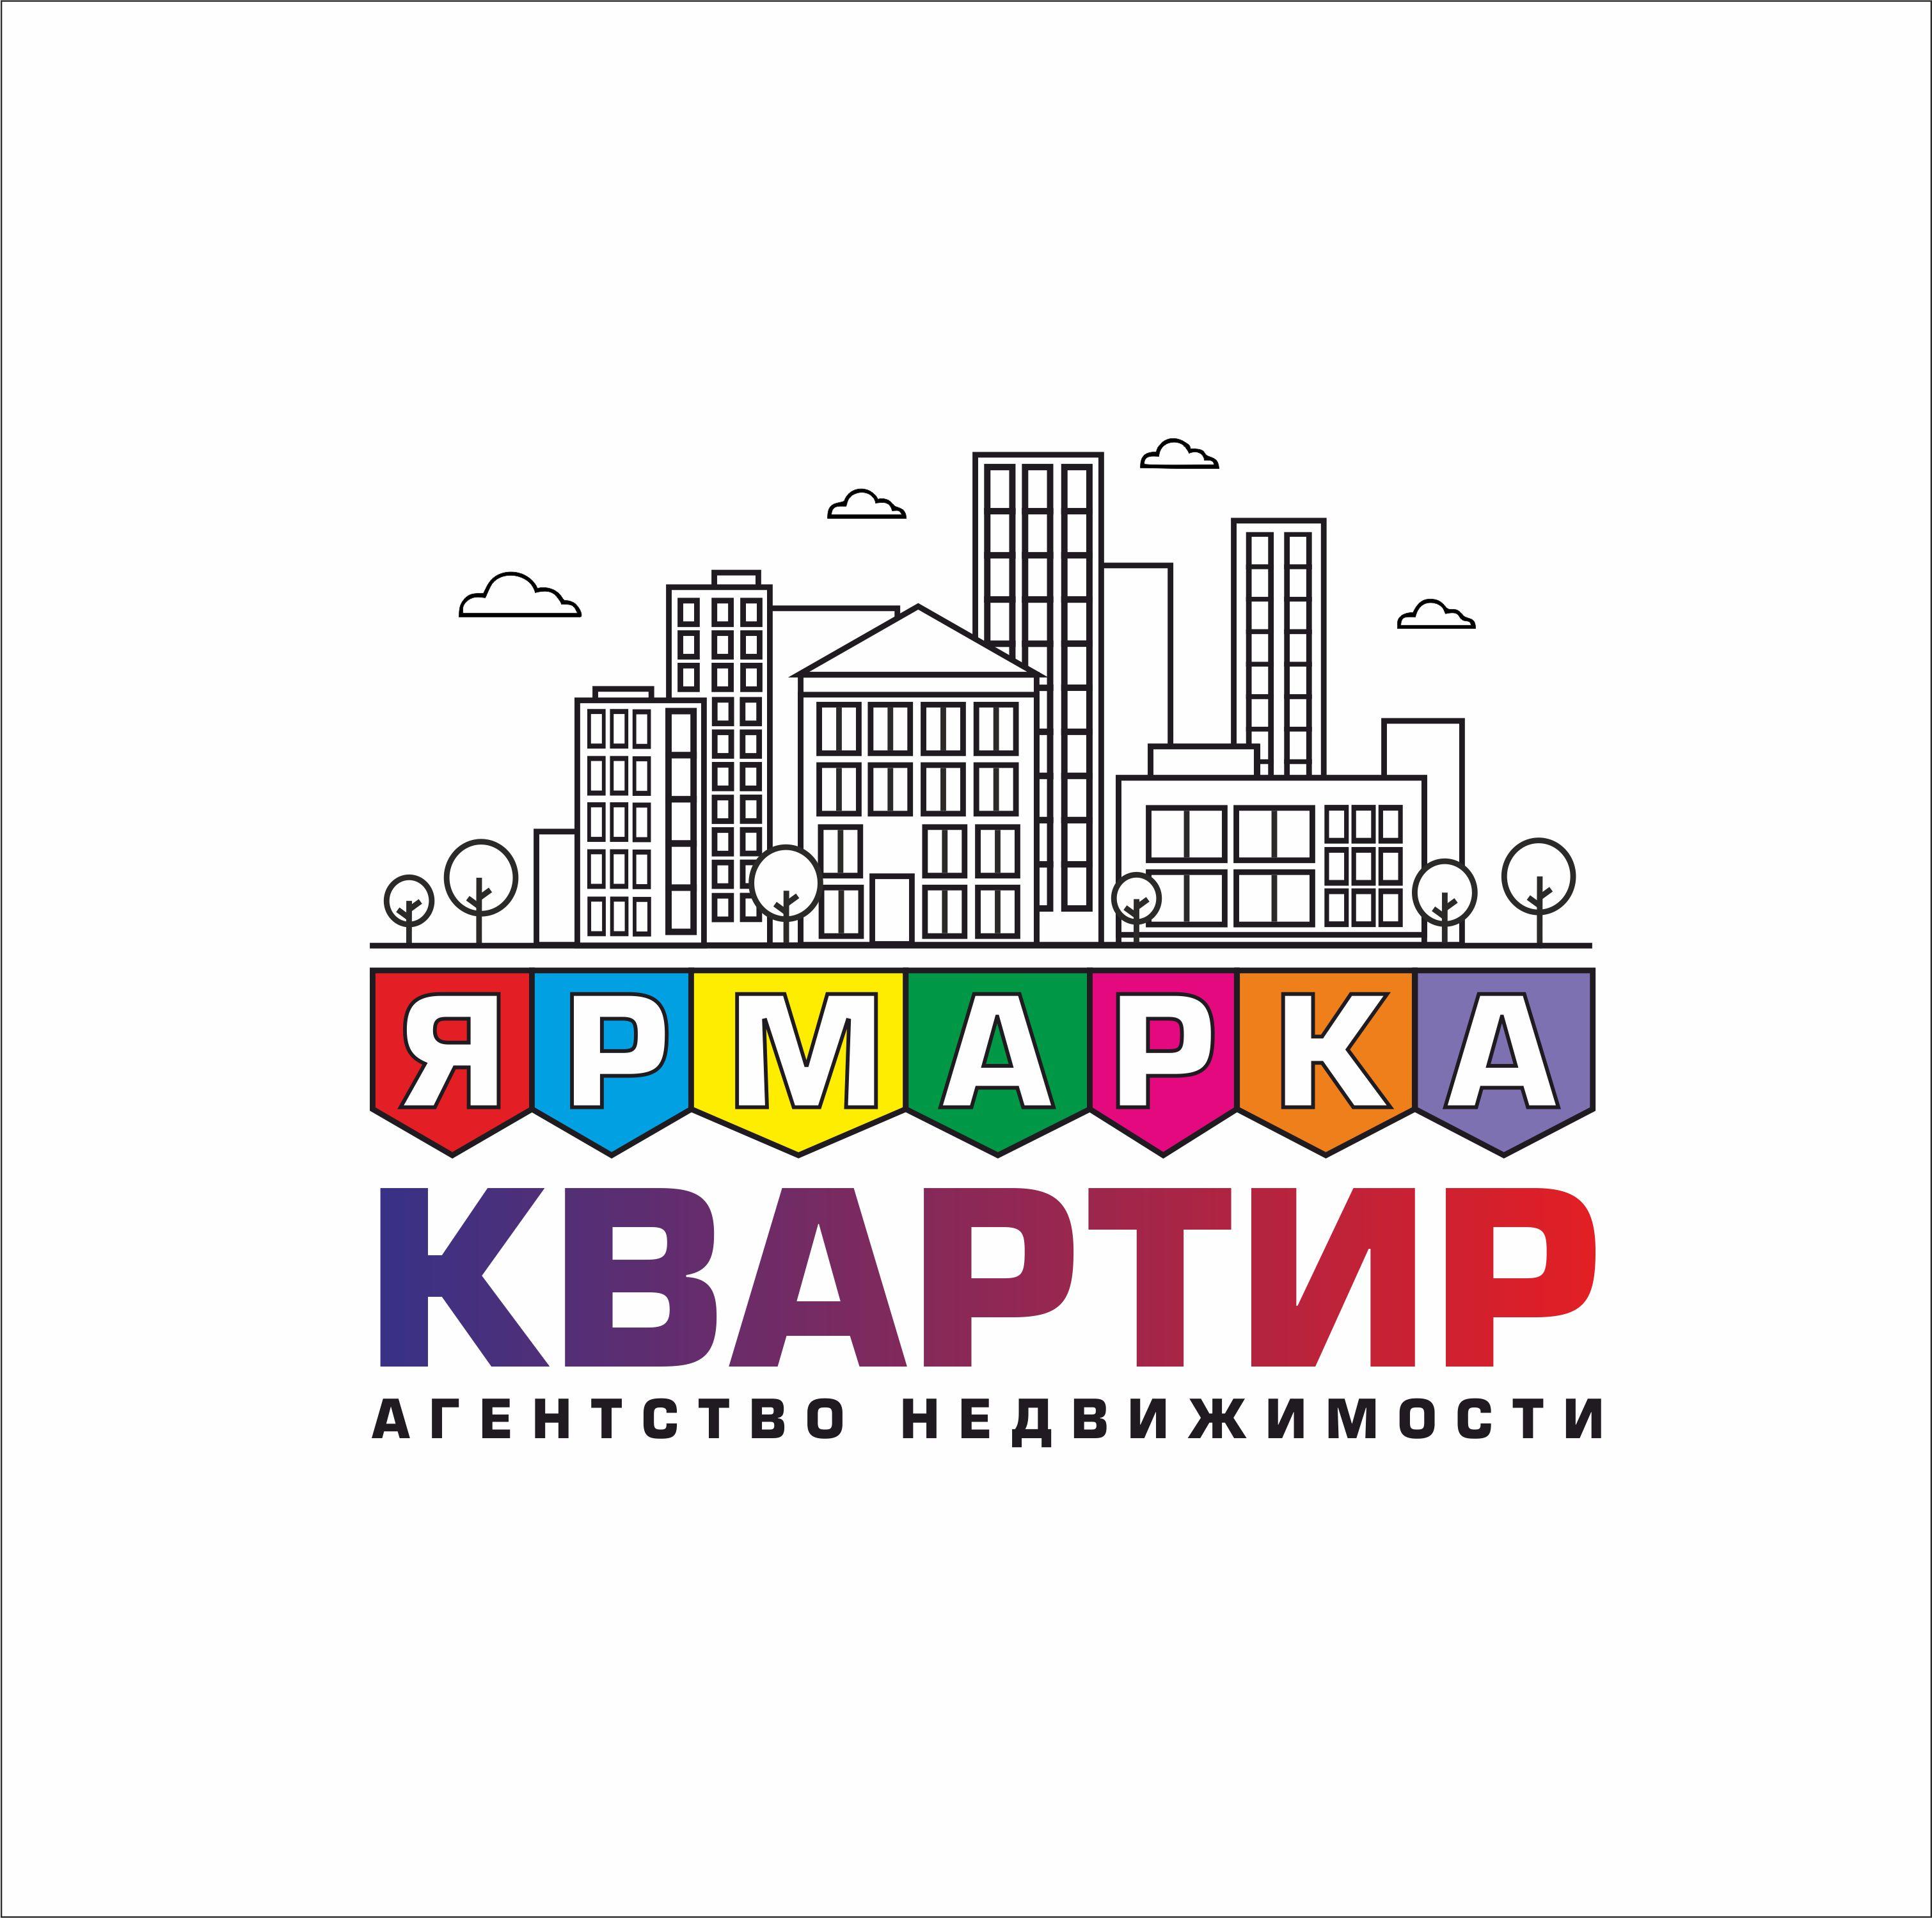 Создание логотипа, с вариантами для визитки и листовки фото f_38360085a095b3ce.jpg